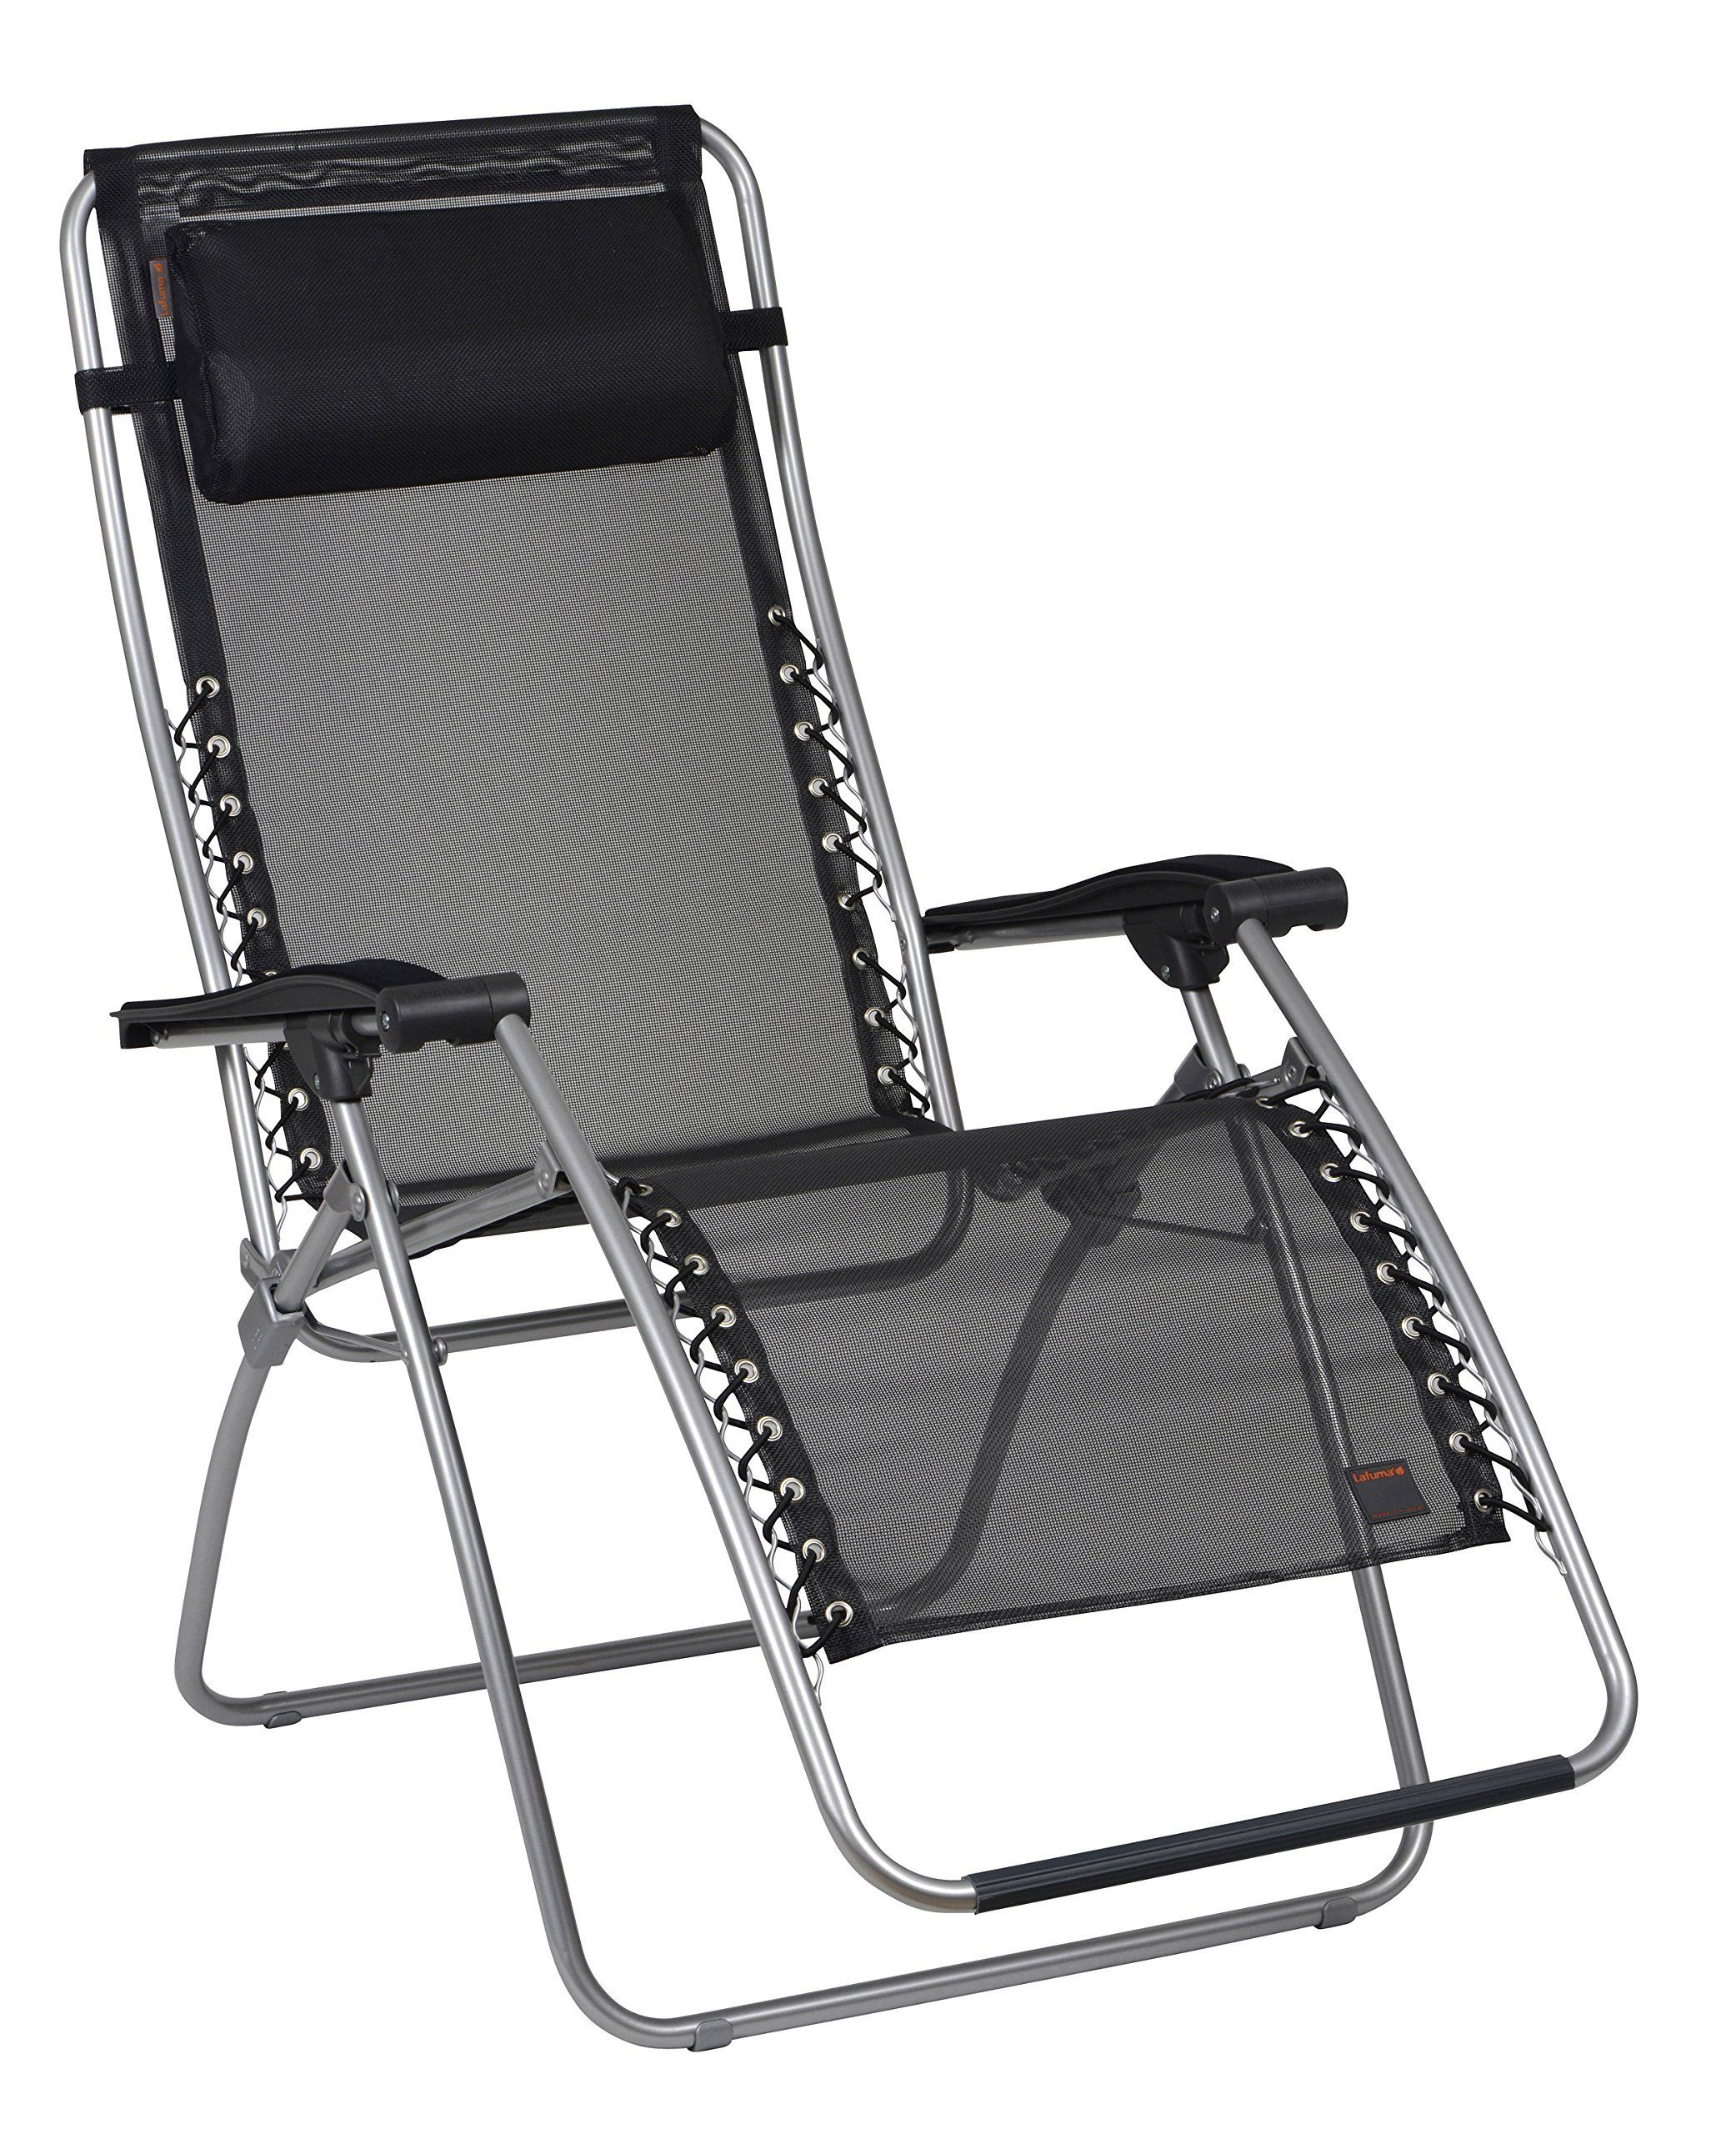 Lafuma Fauteuil Relax Position Reglable Structure En Acier Hle Batyline Rsxa Couleur Noir Lfm12266717 With Images Camping Furniture Folding Chair Outdoor Chairs